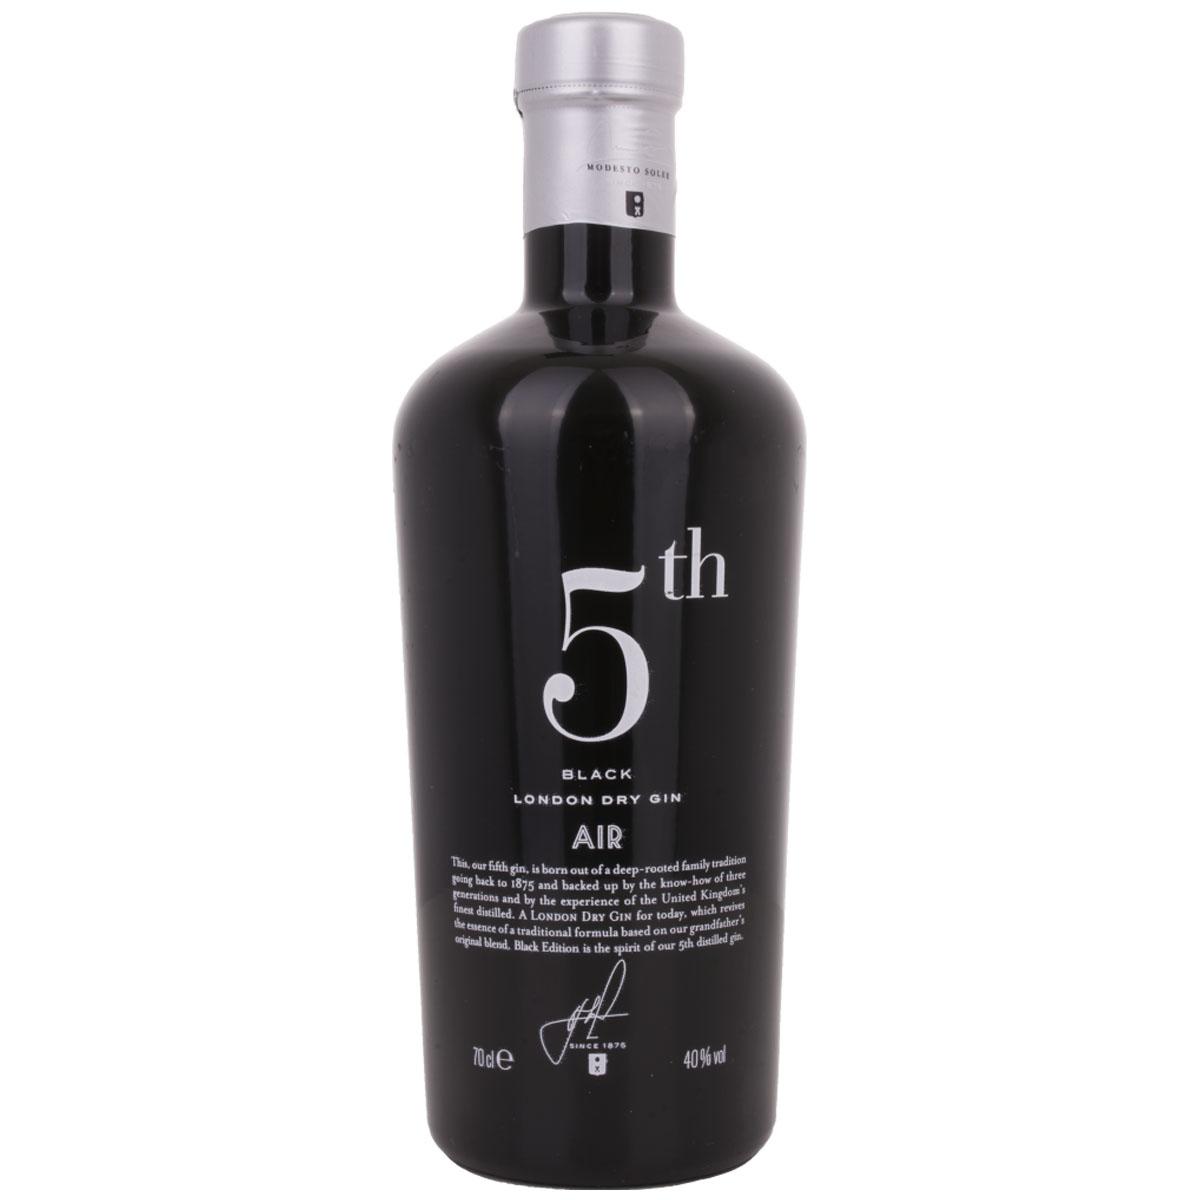 5th AIR Black London Dry Gin